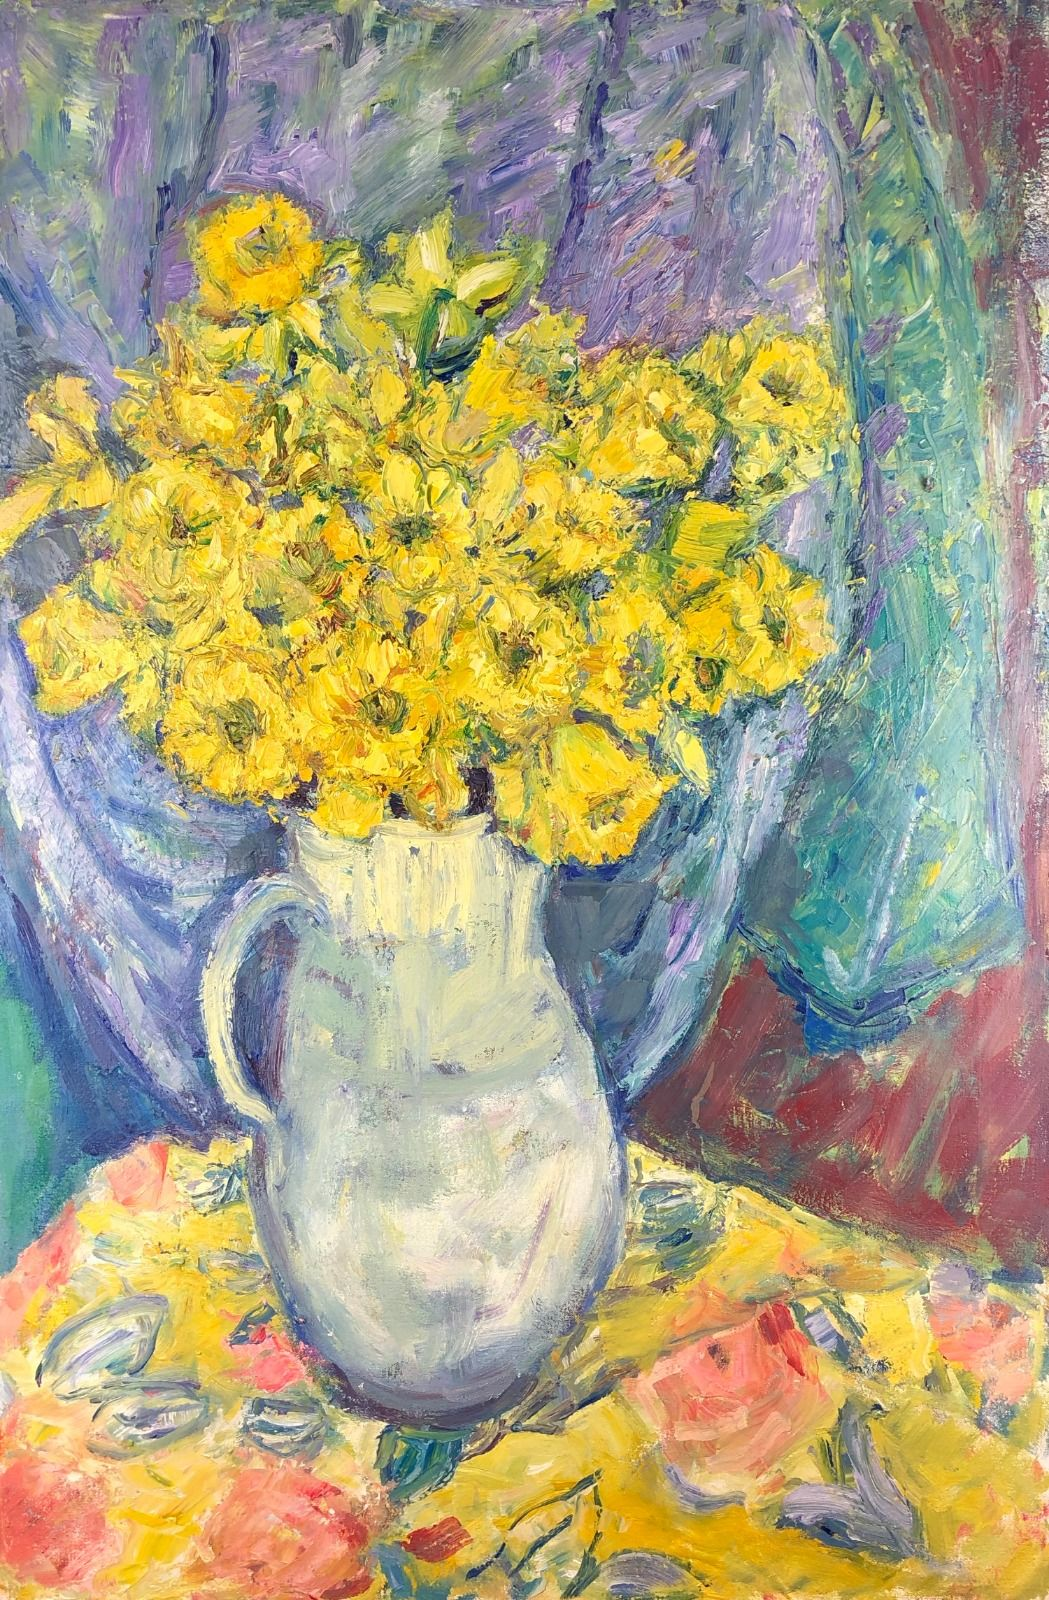 Daffodils in a Jug 2. 36in x 24in